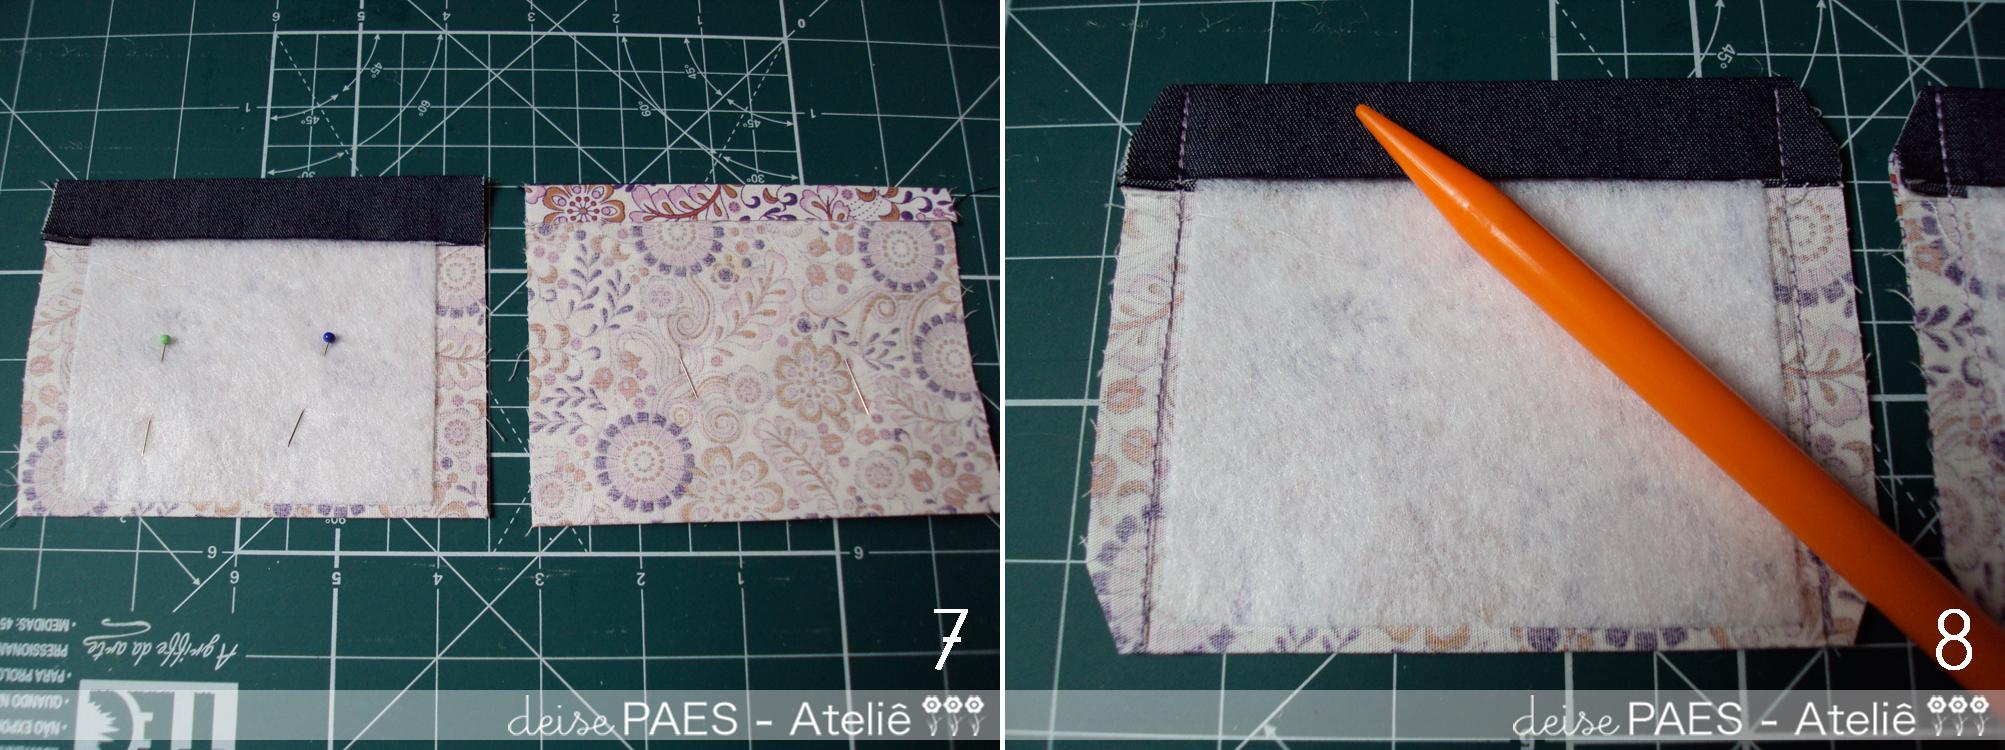 porta-absorventes - 04